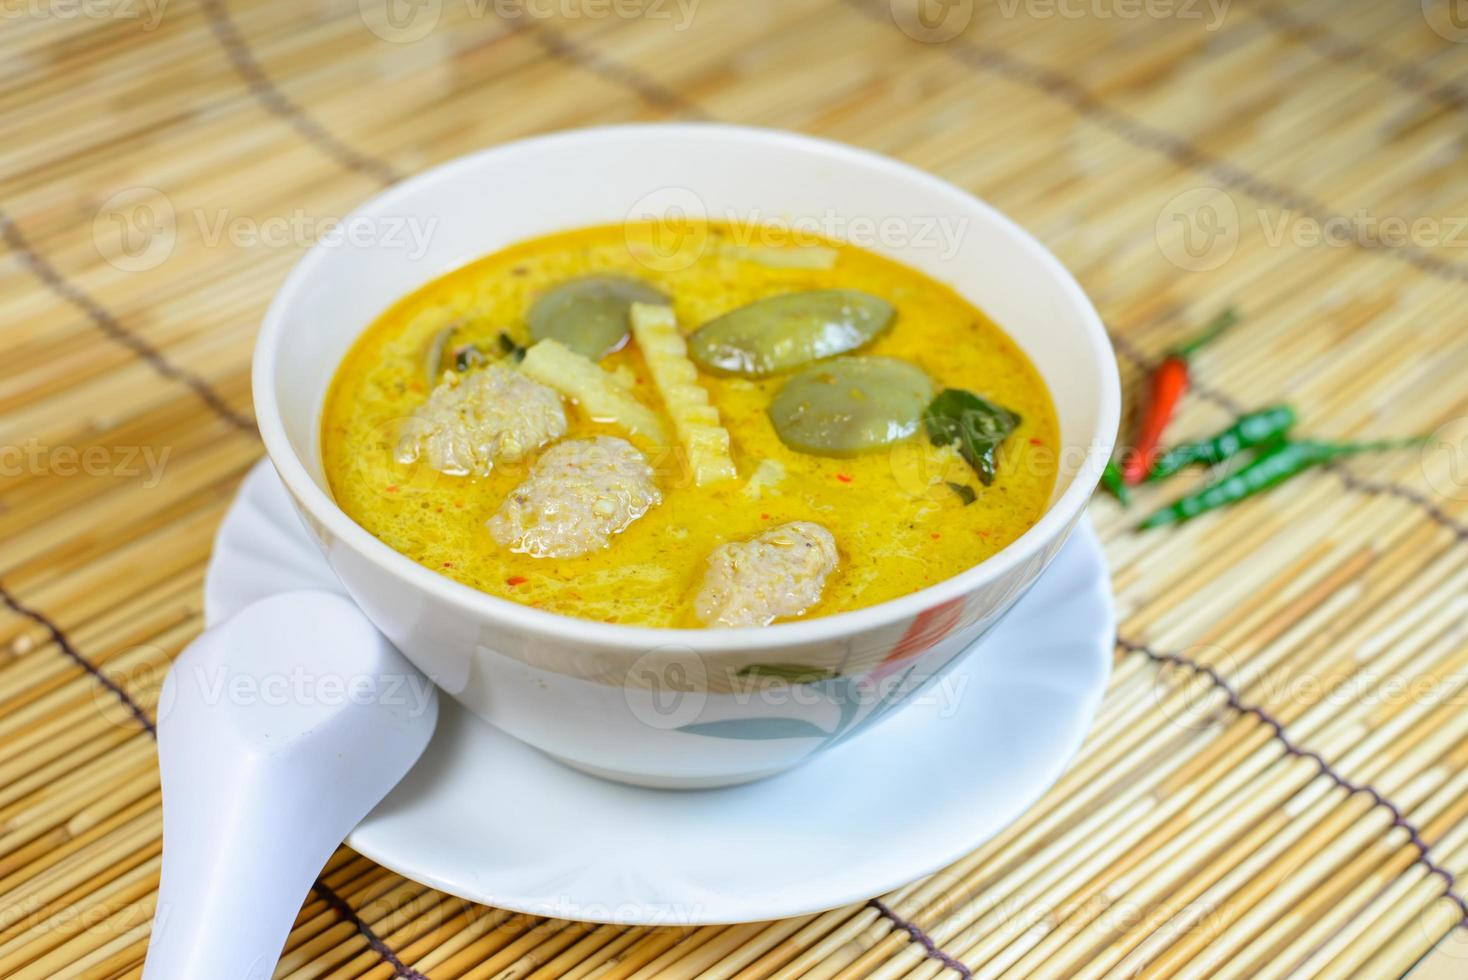 curry verde della carne di maiale al curry, cucina tailandese foto